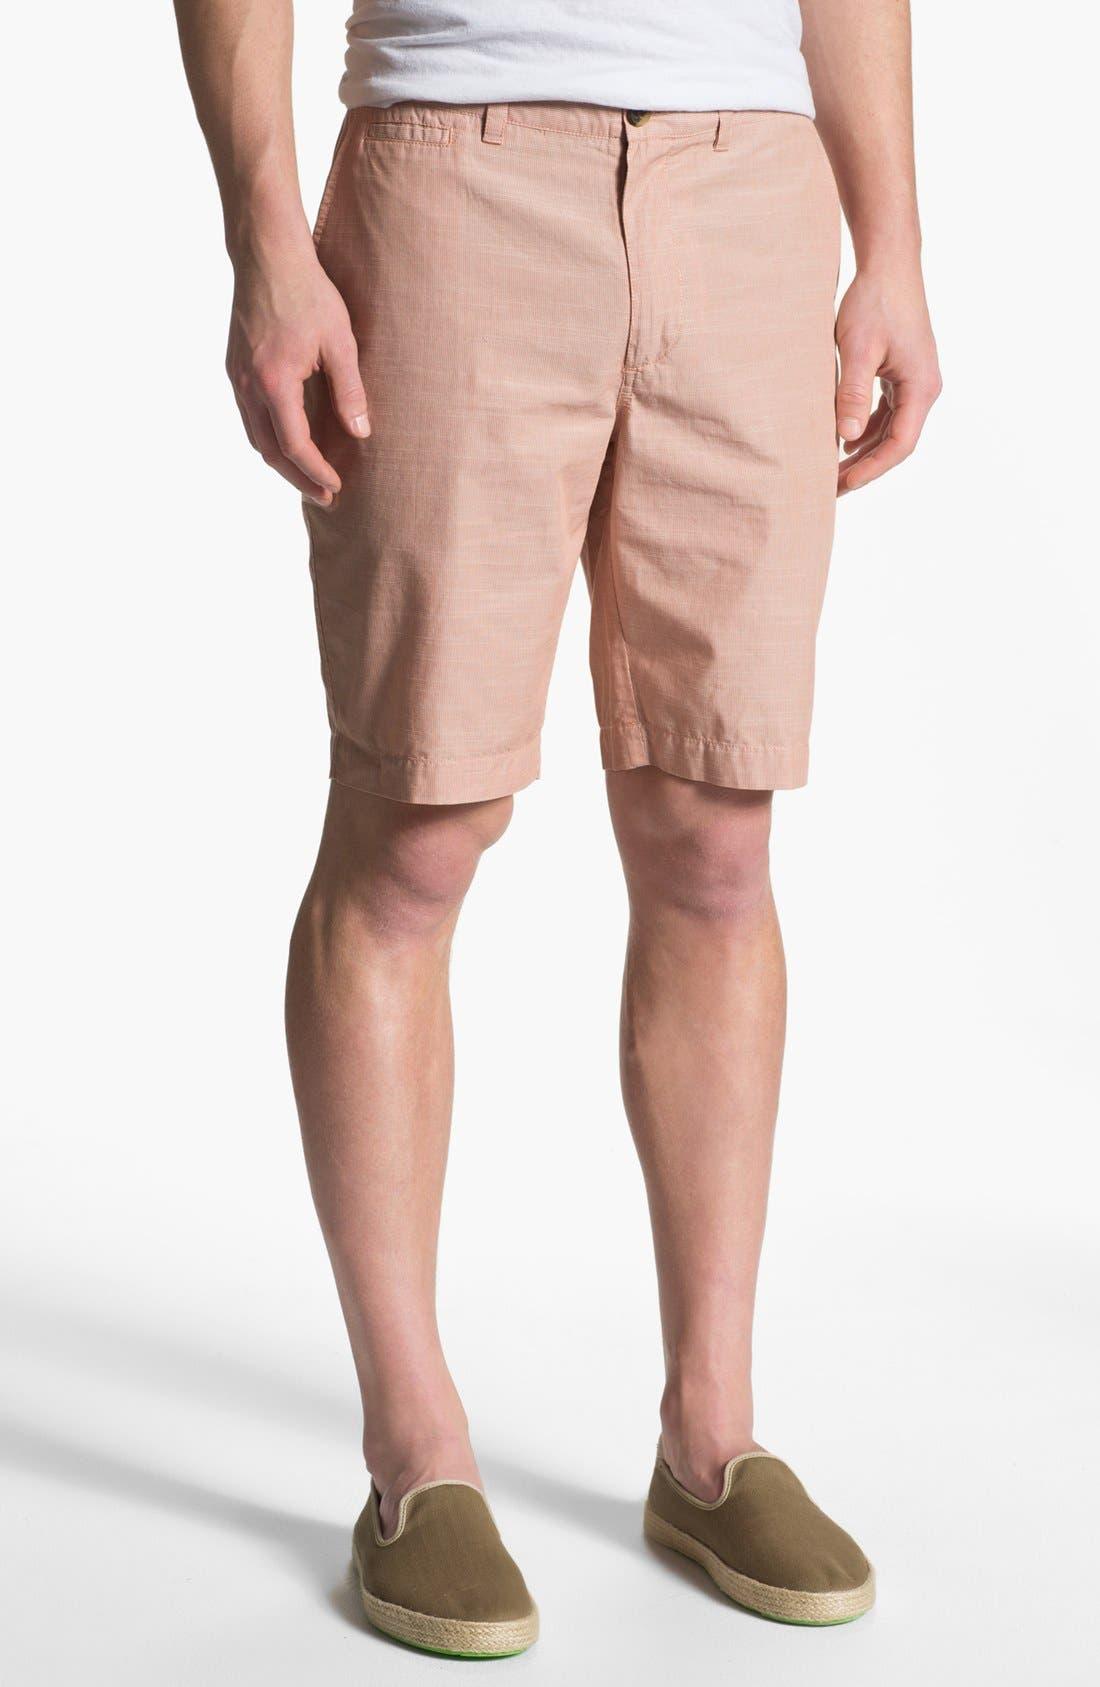 Main Image - Wallin & Bros. 'Lanspur' Flat Front Shorts